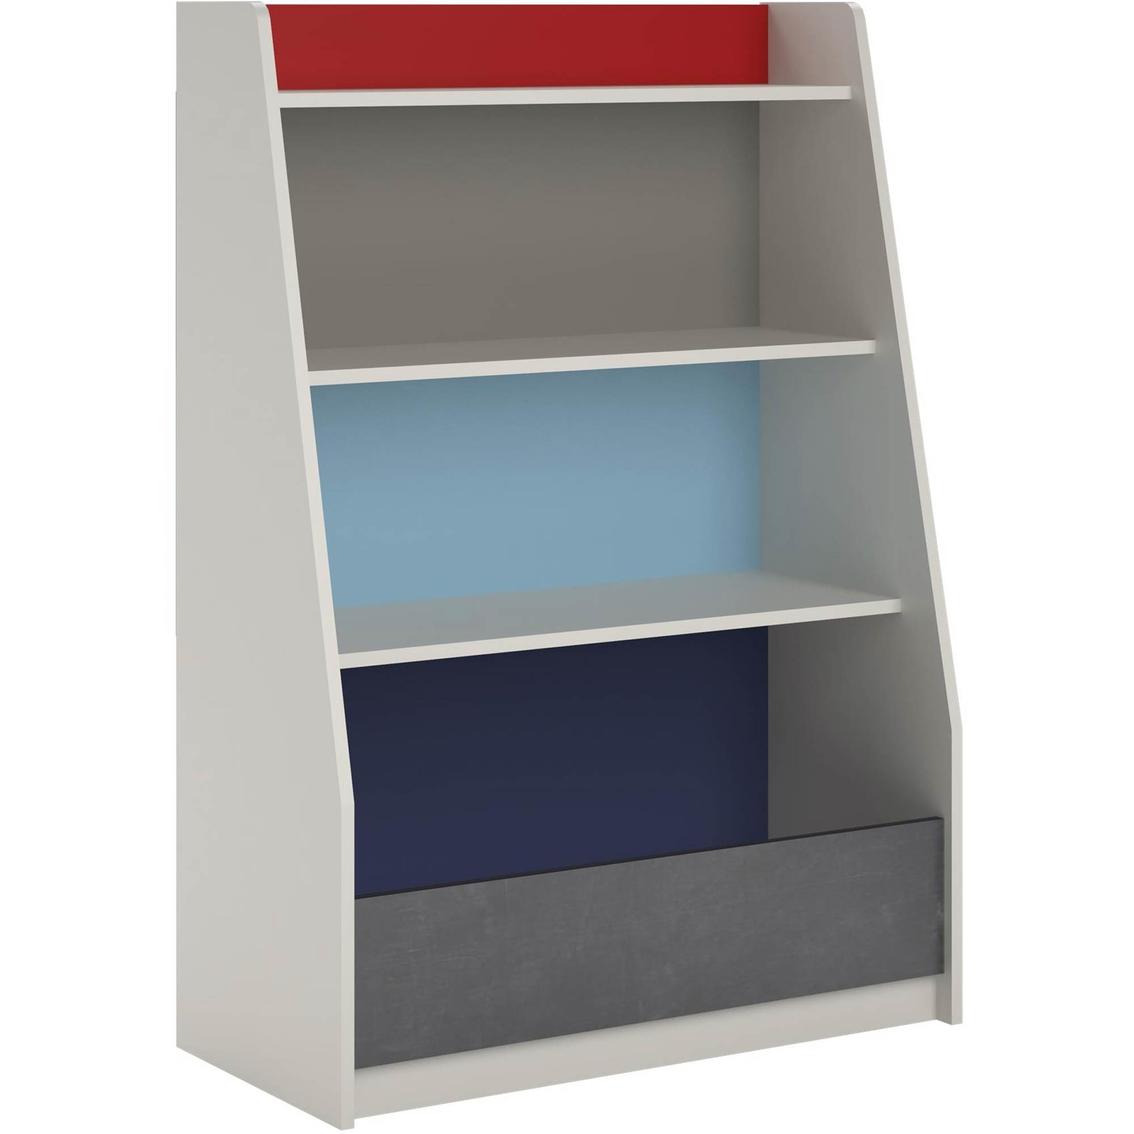 Cosco Kaleidoscope Storage Bookcase Bookcases Cabinets